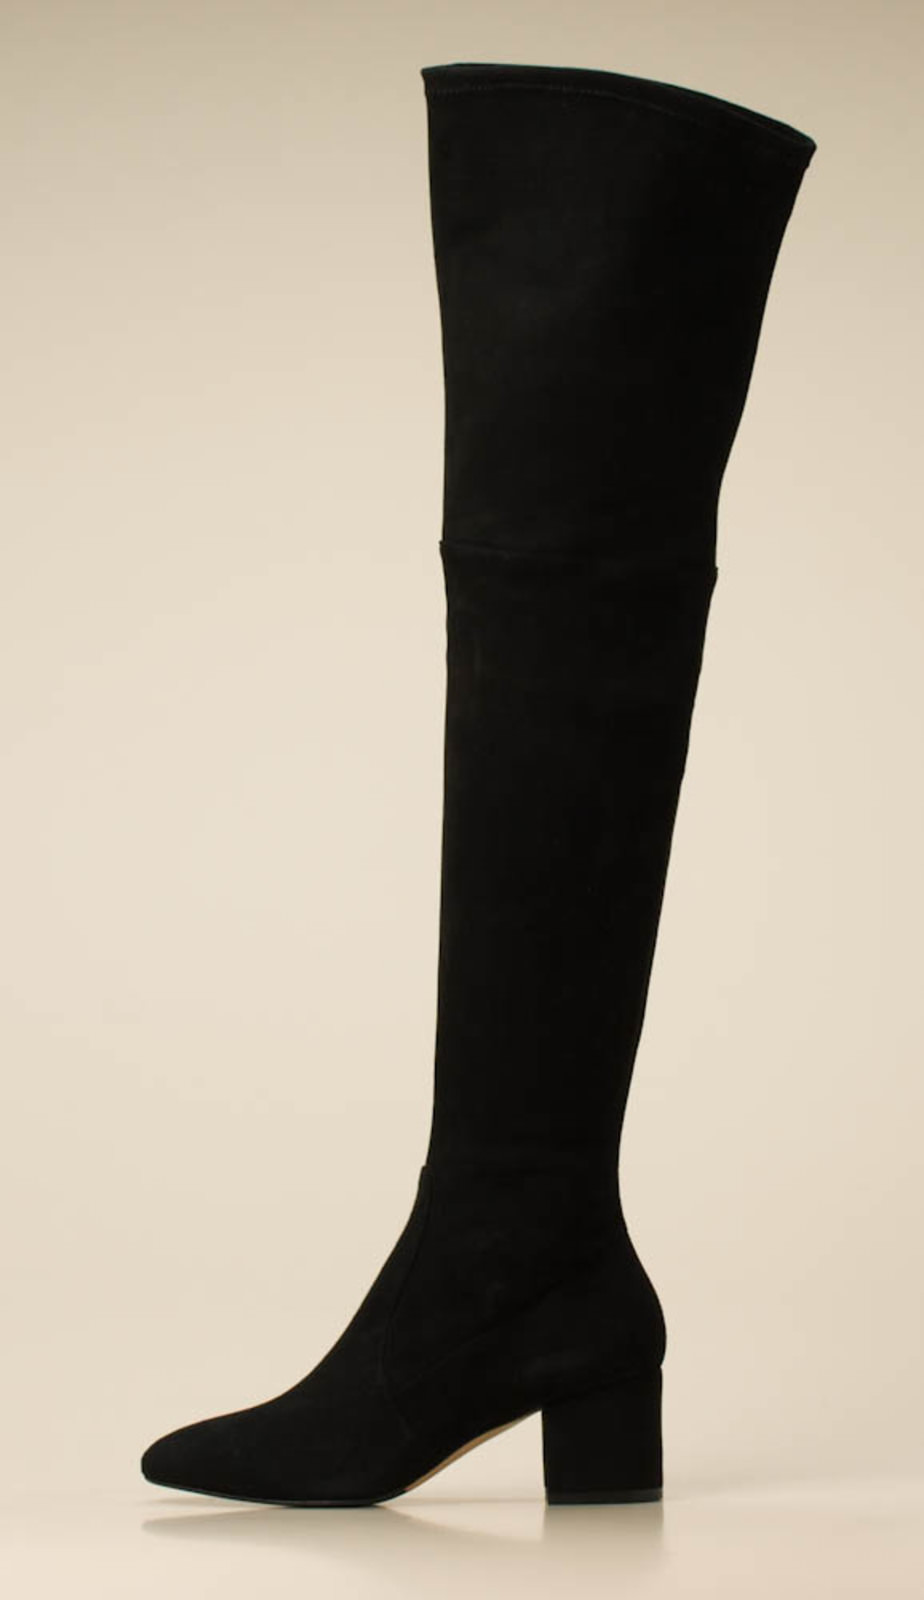 konstantin starke damen overknee stiefel in schwarz kaufen. Black Bedroom Furniture Sets. Home Design Ideas